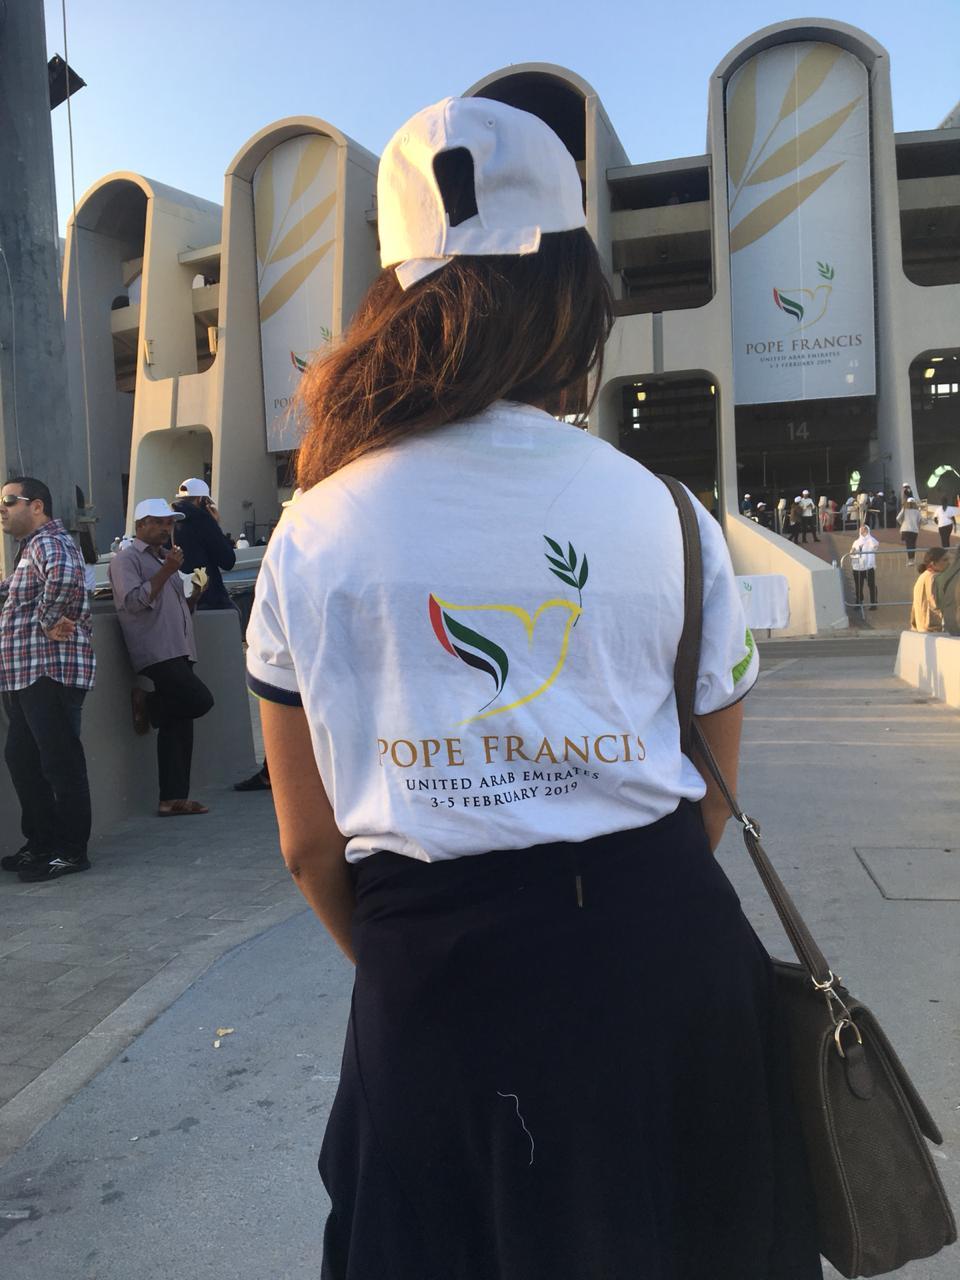 Devotees gathered for the Papal mass in Abu Dhabi on February 5, 2019. (Al Arabiya)